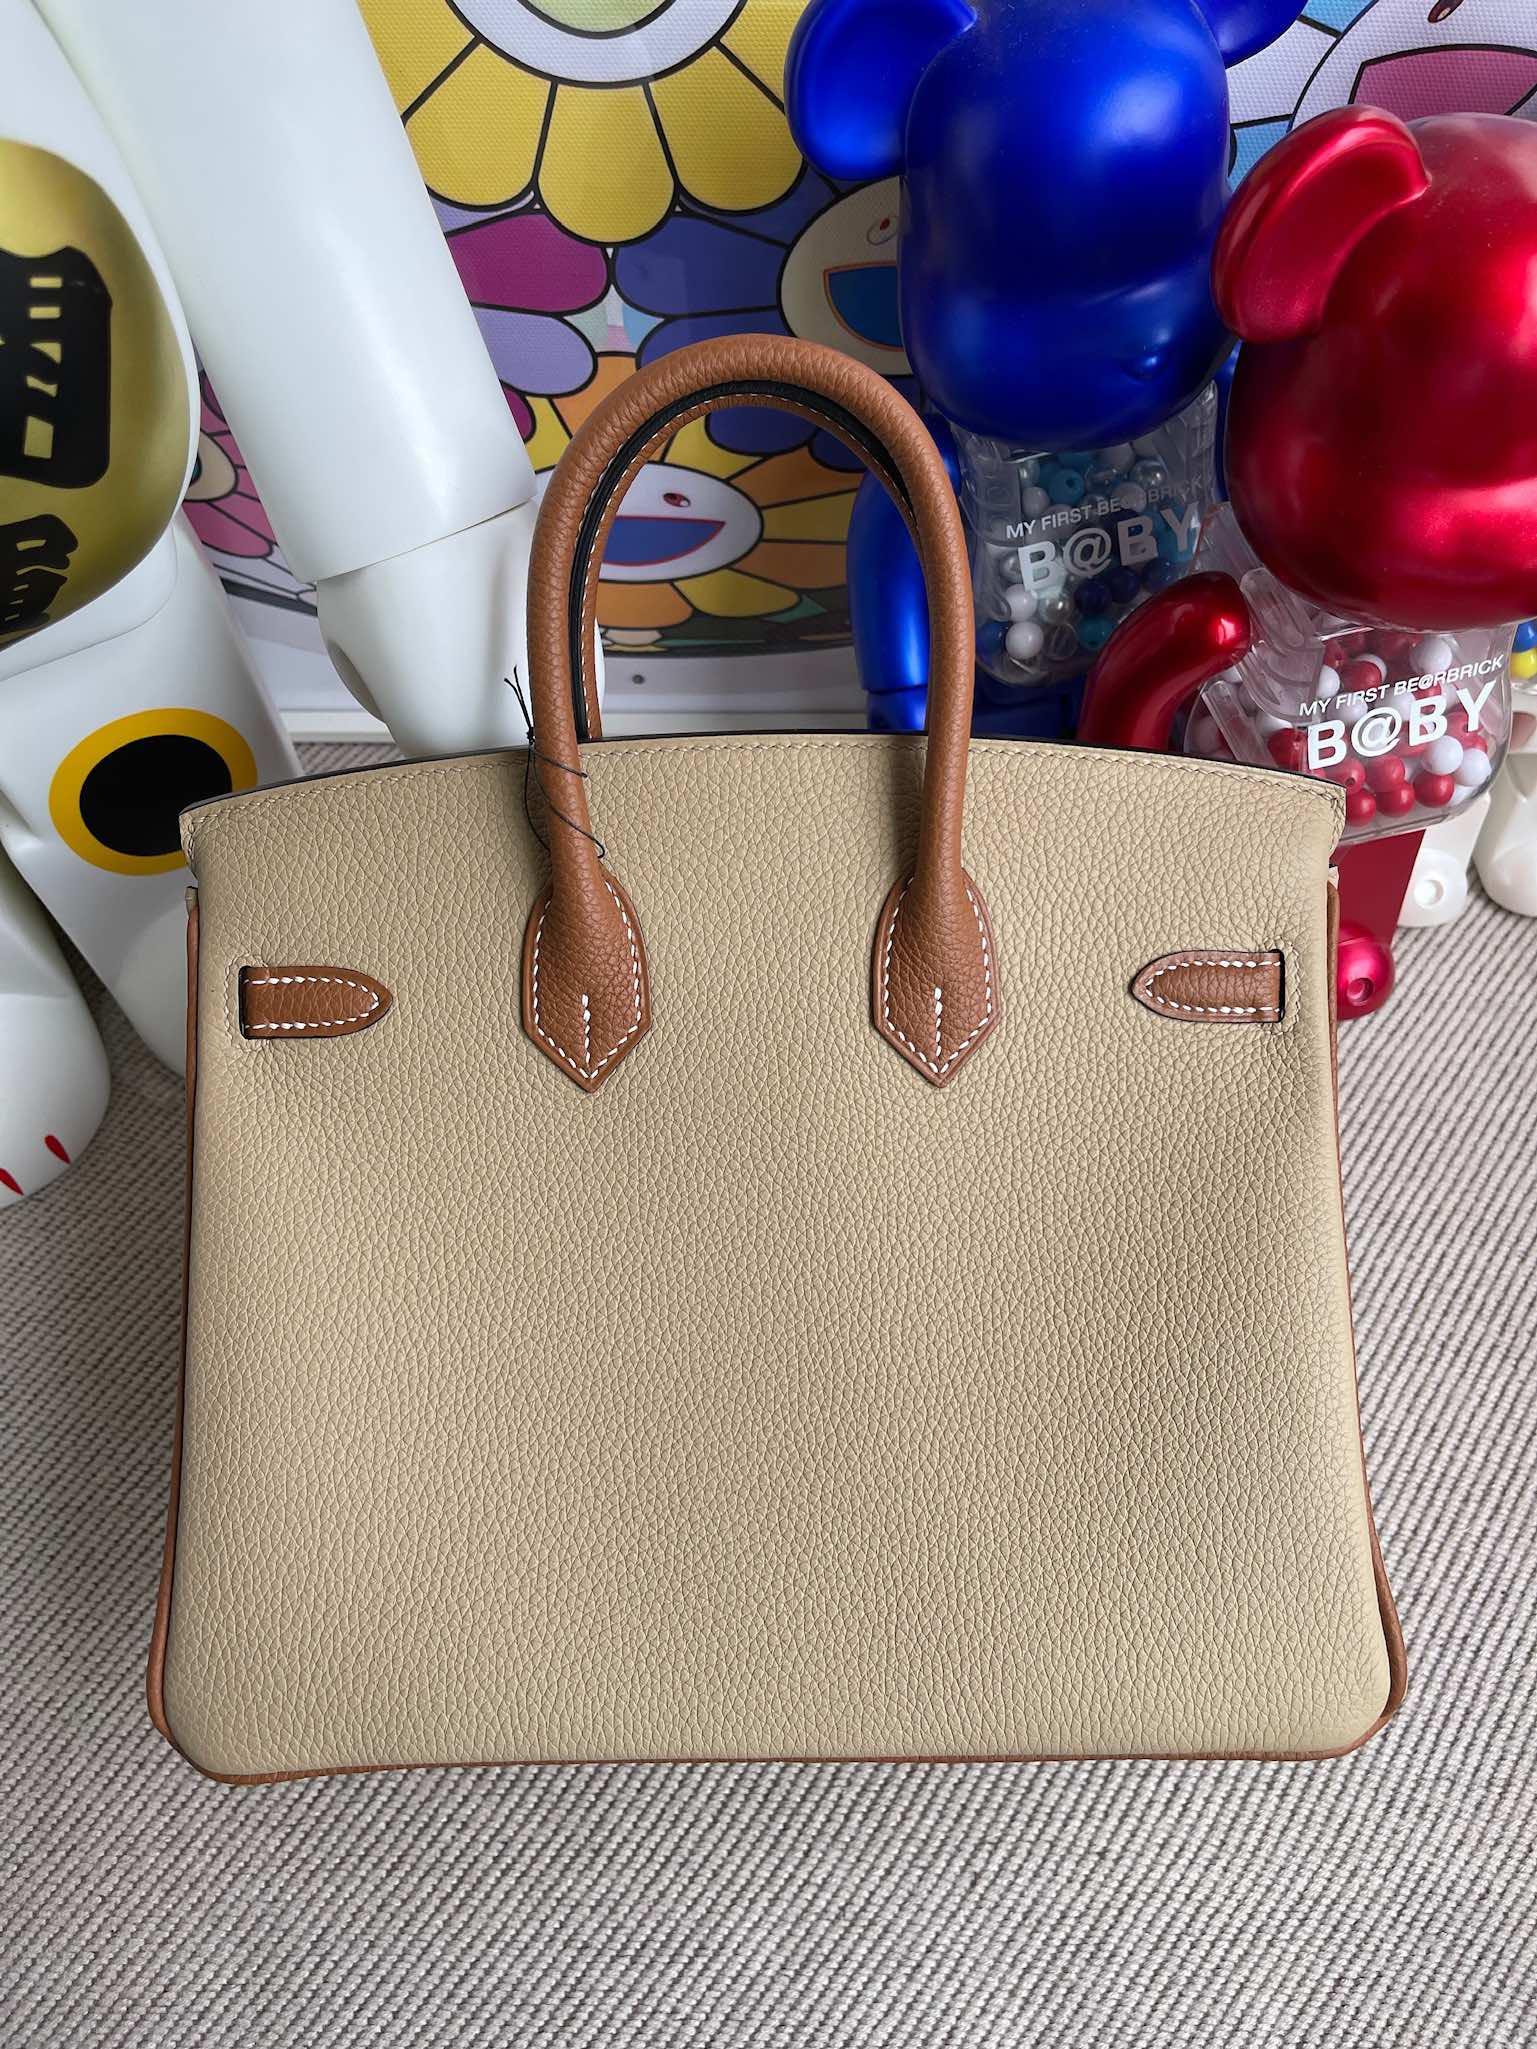 Hermès(爱马仕)Birkin 铂金包 原厂小牛皮 togo S2 风衣灰 拼 金棕 金扣 马蹄印 25cm 顶级手缝